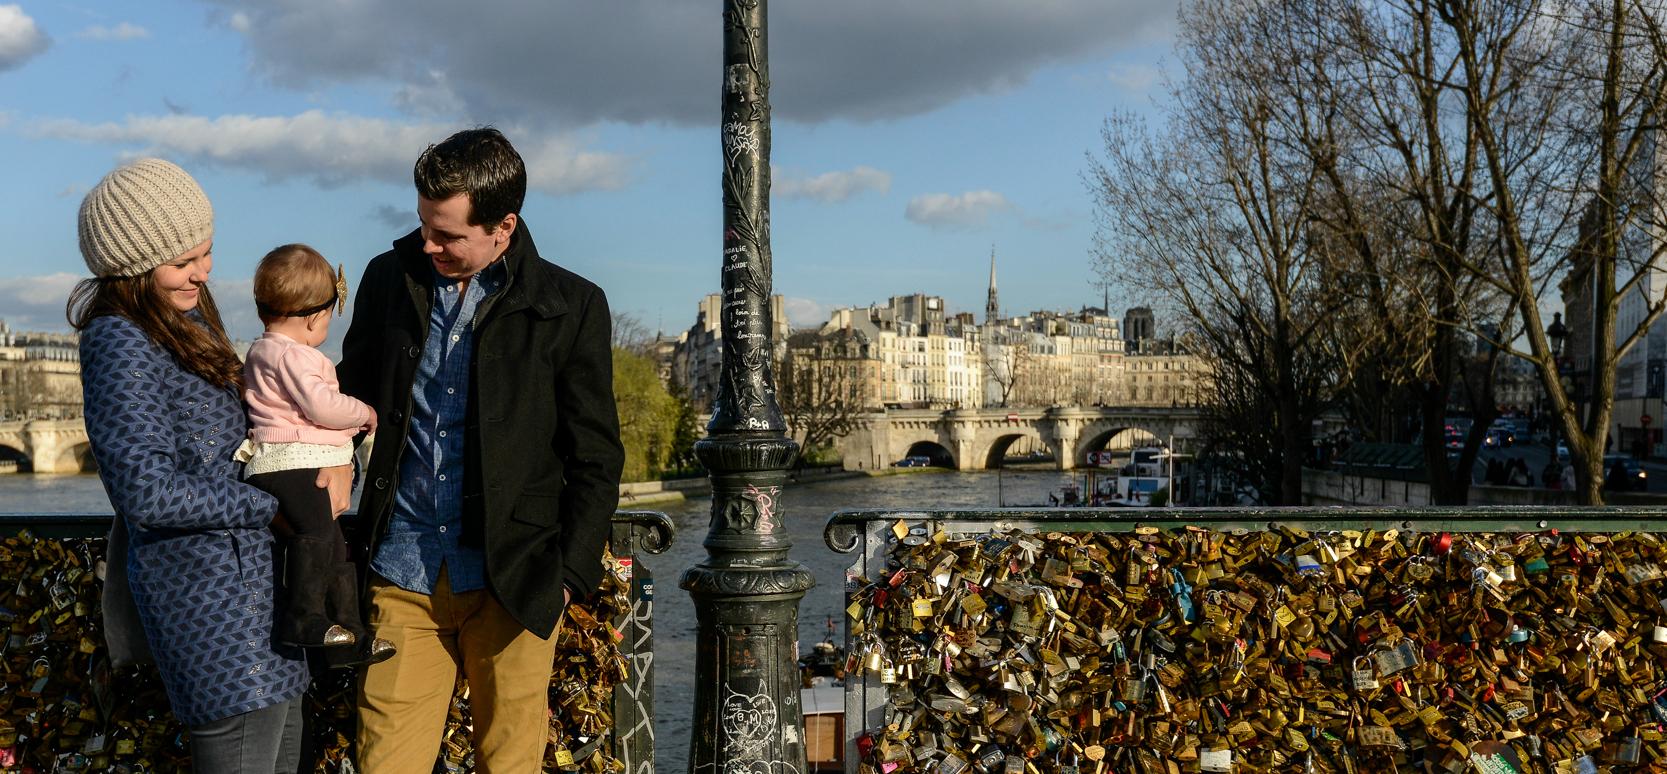 ponte_des_arts_aspiring_kennedy_paris_by_noah_darnell